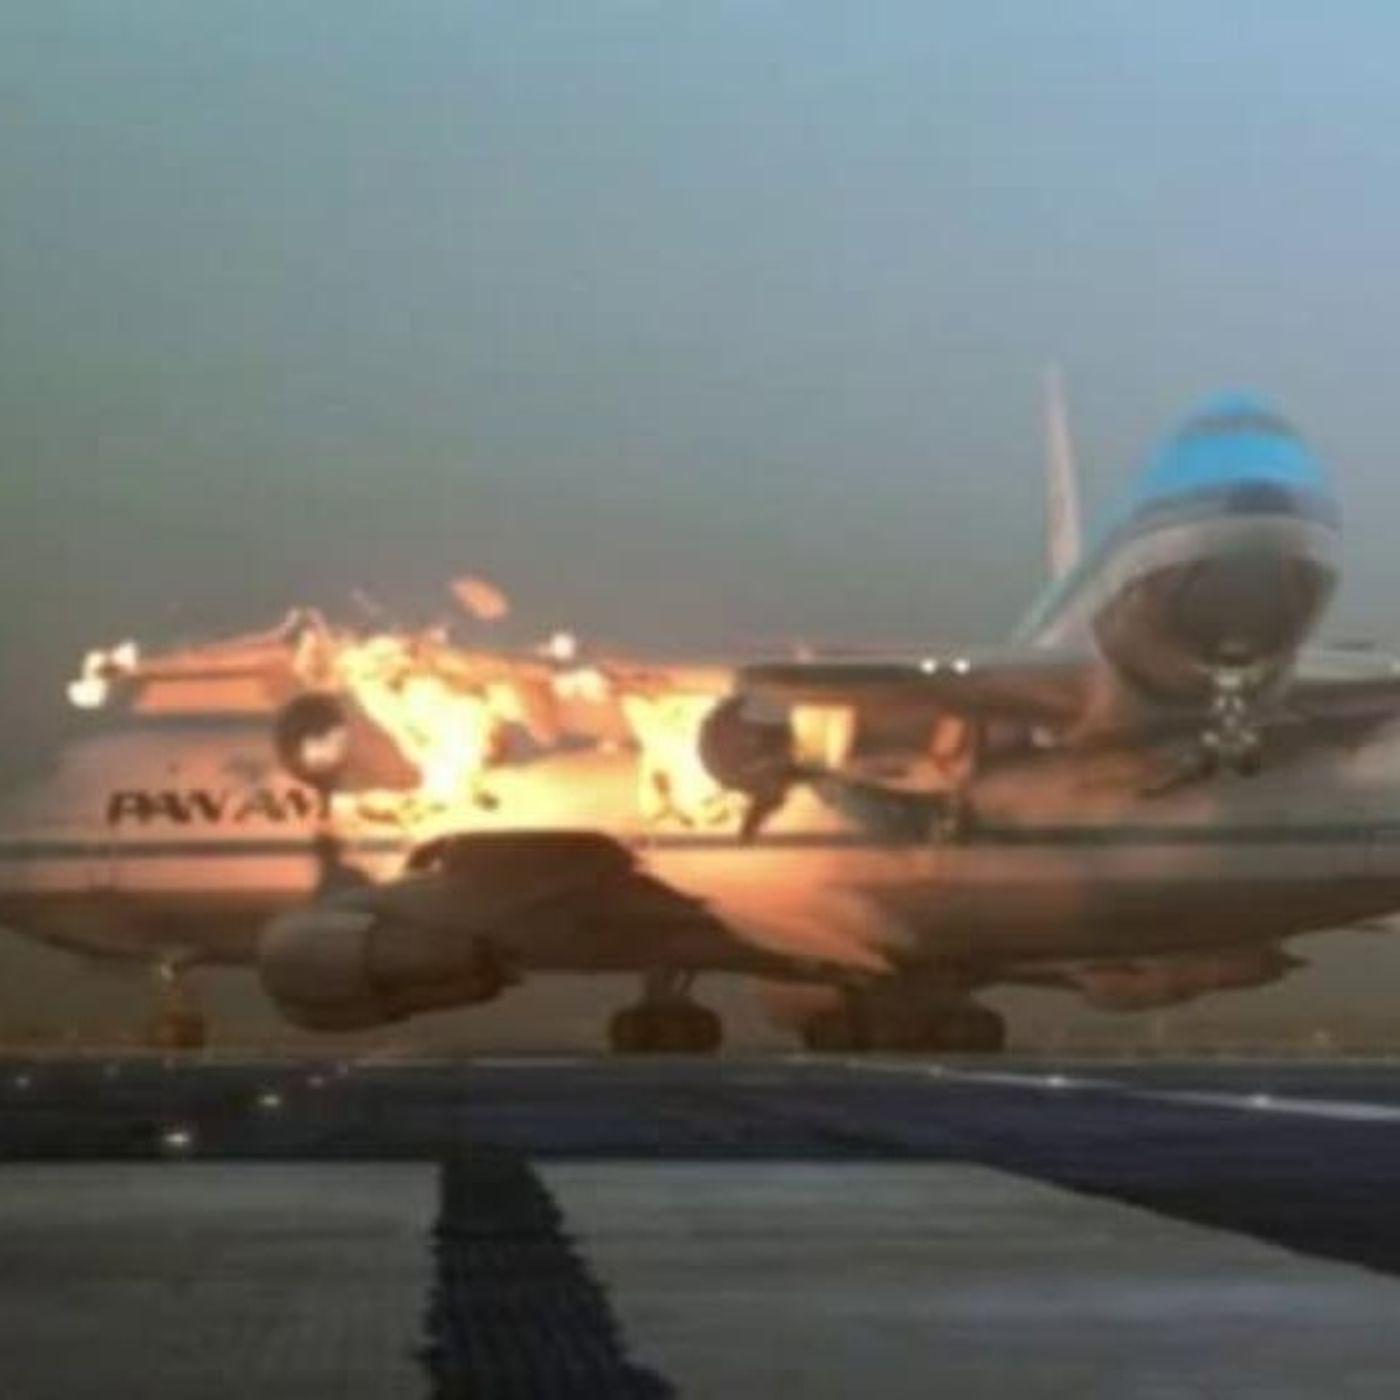 Incomprensione fatale - Voli PanAm 1736 & KLM 4805